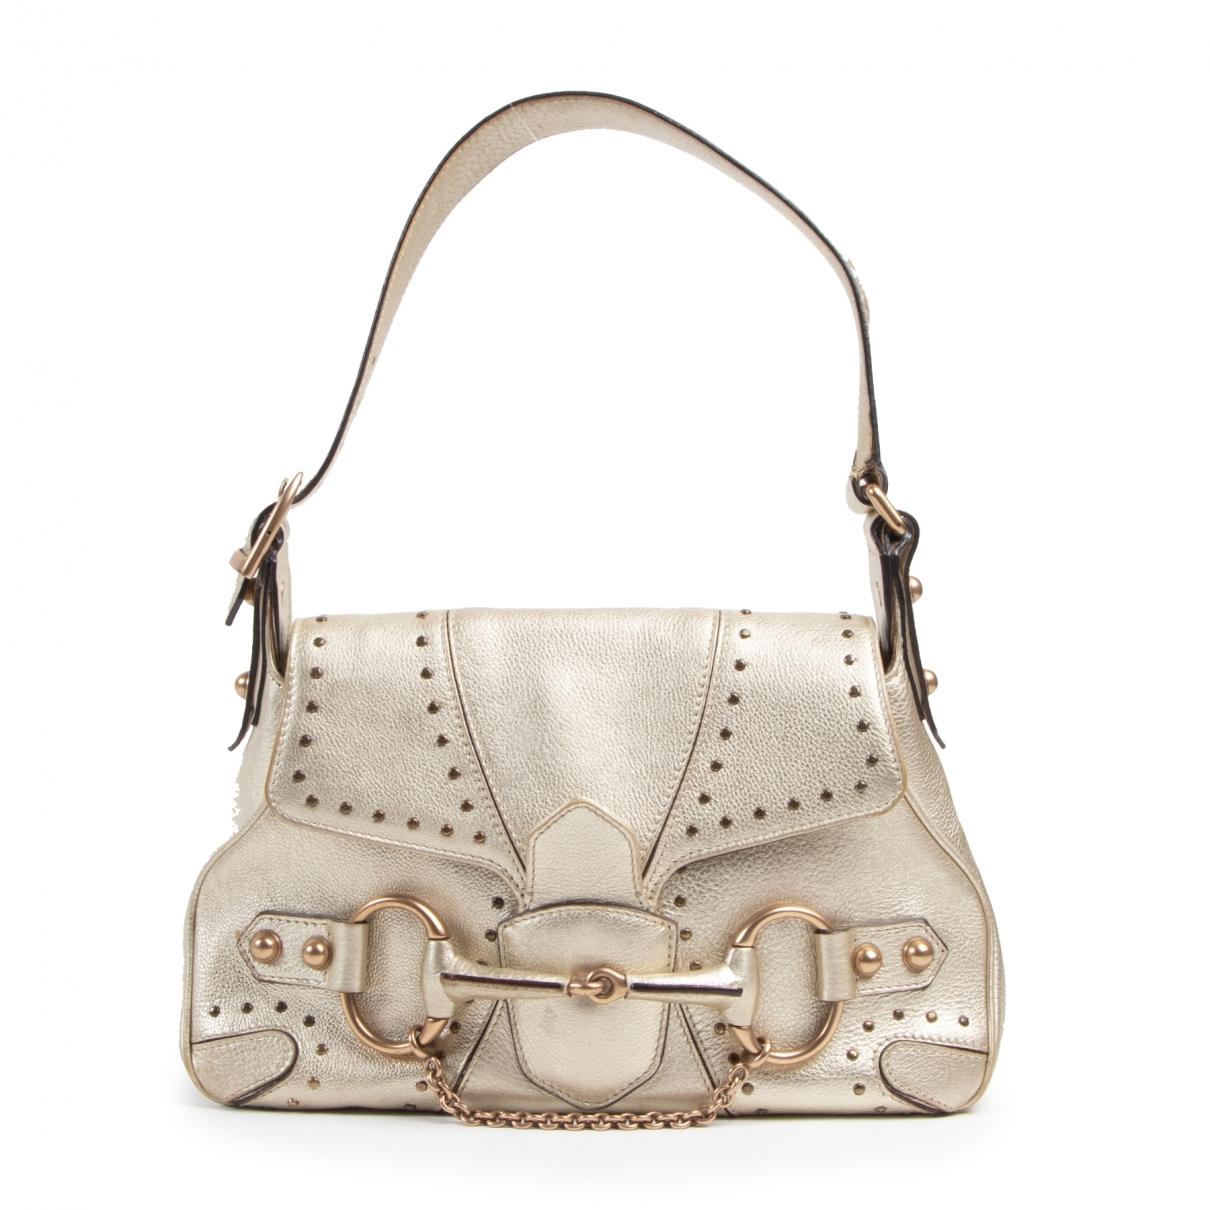 Gucci \N Gold Leather handbag for Women \N